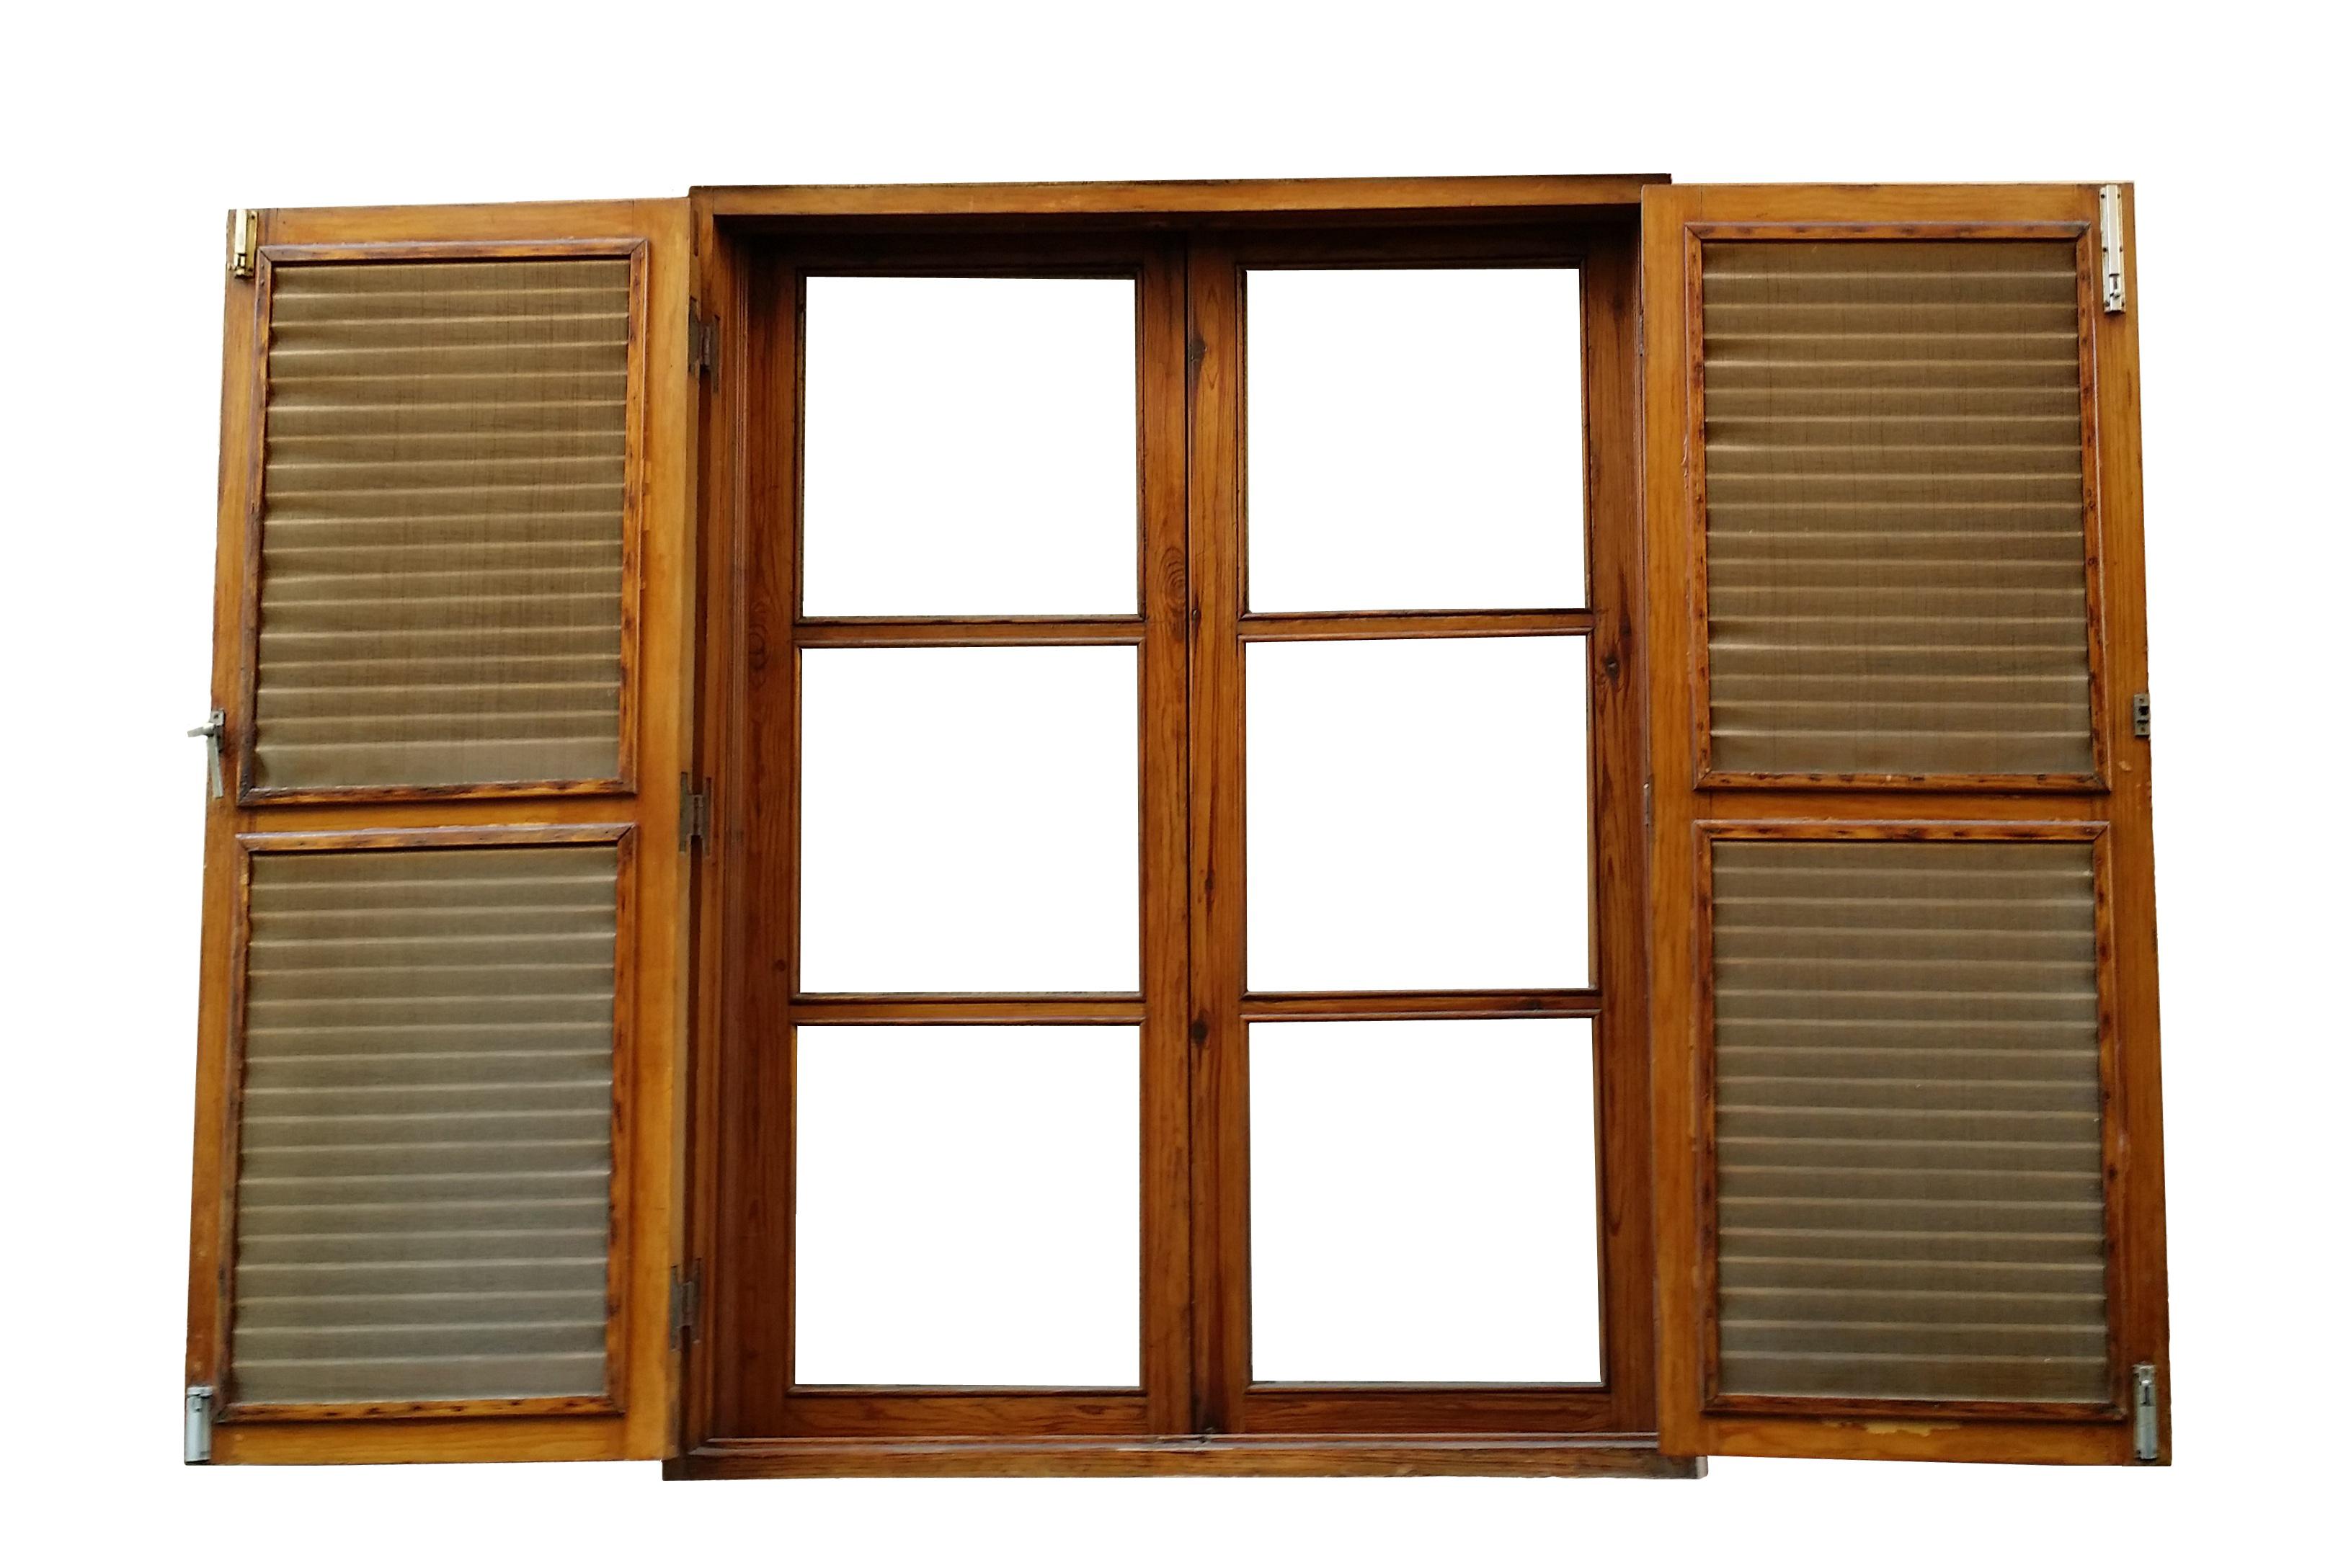 window-669101_Clip